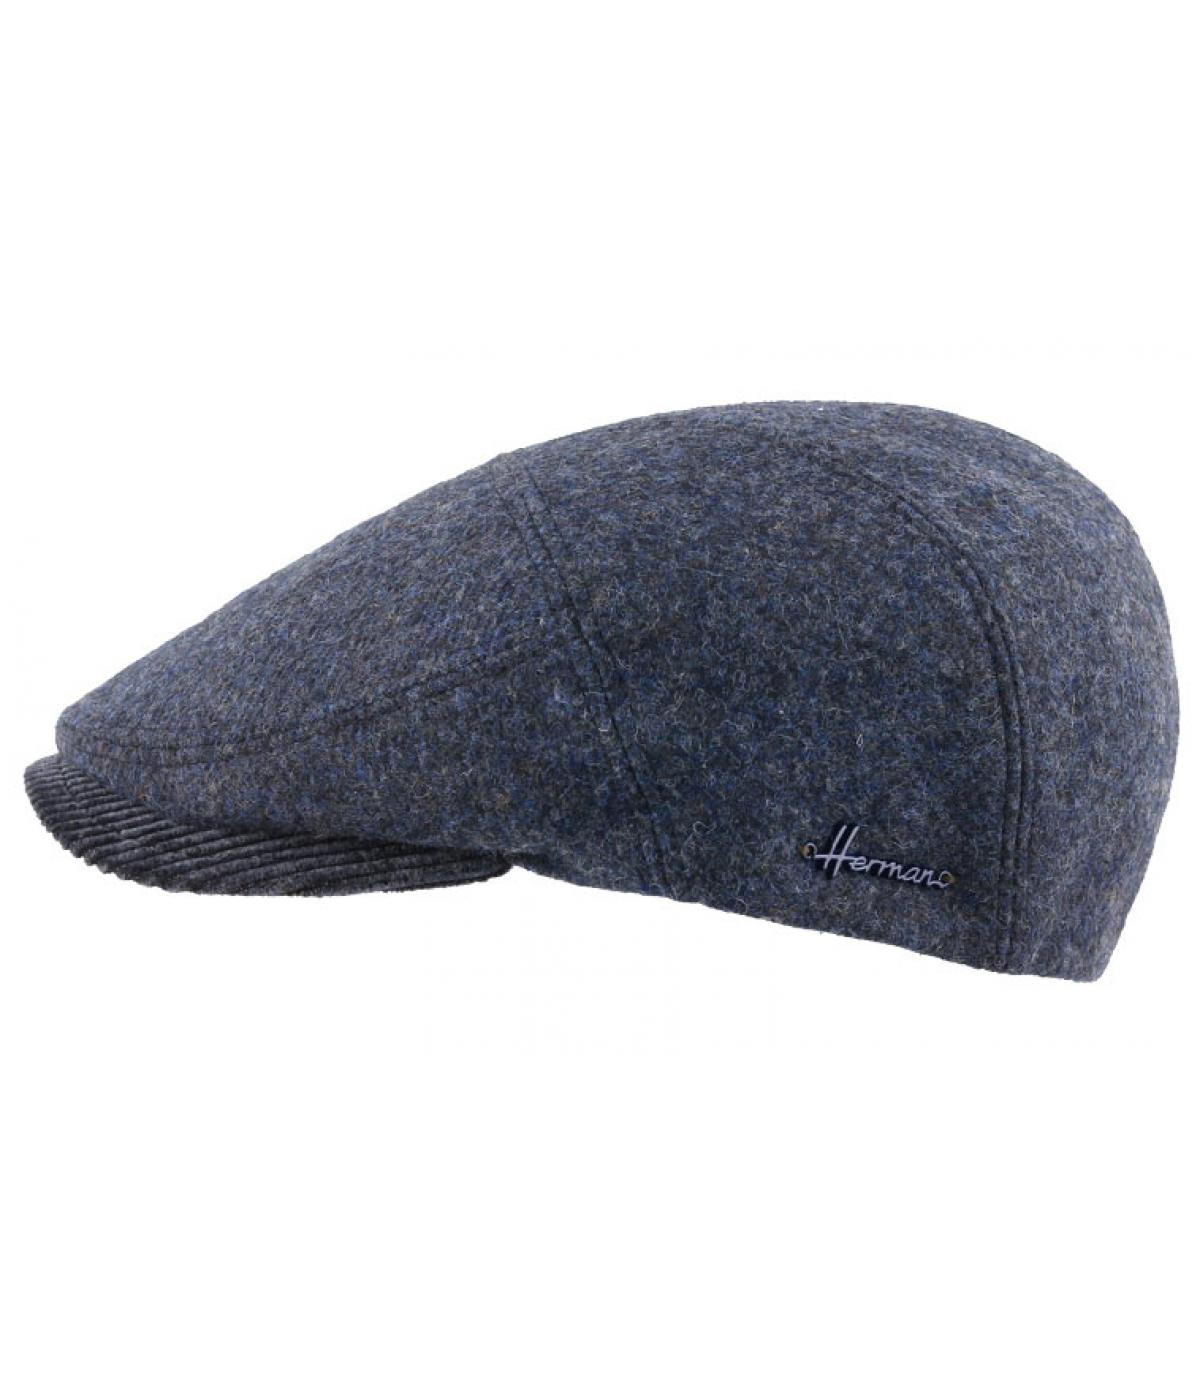 Dettagli Dispatch Wool Corduroy blue - image 2